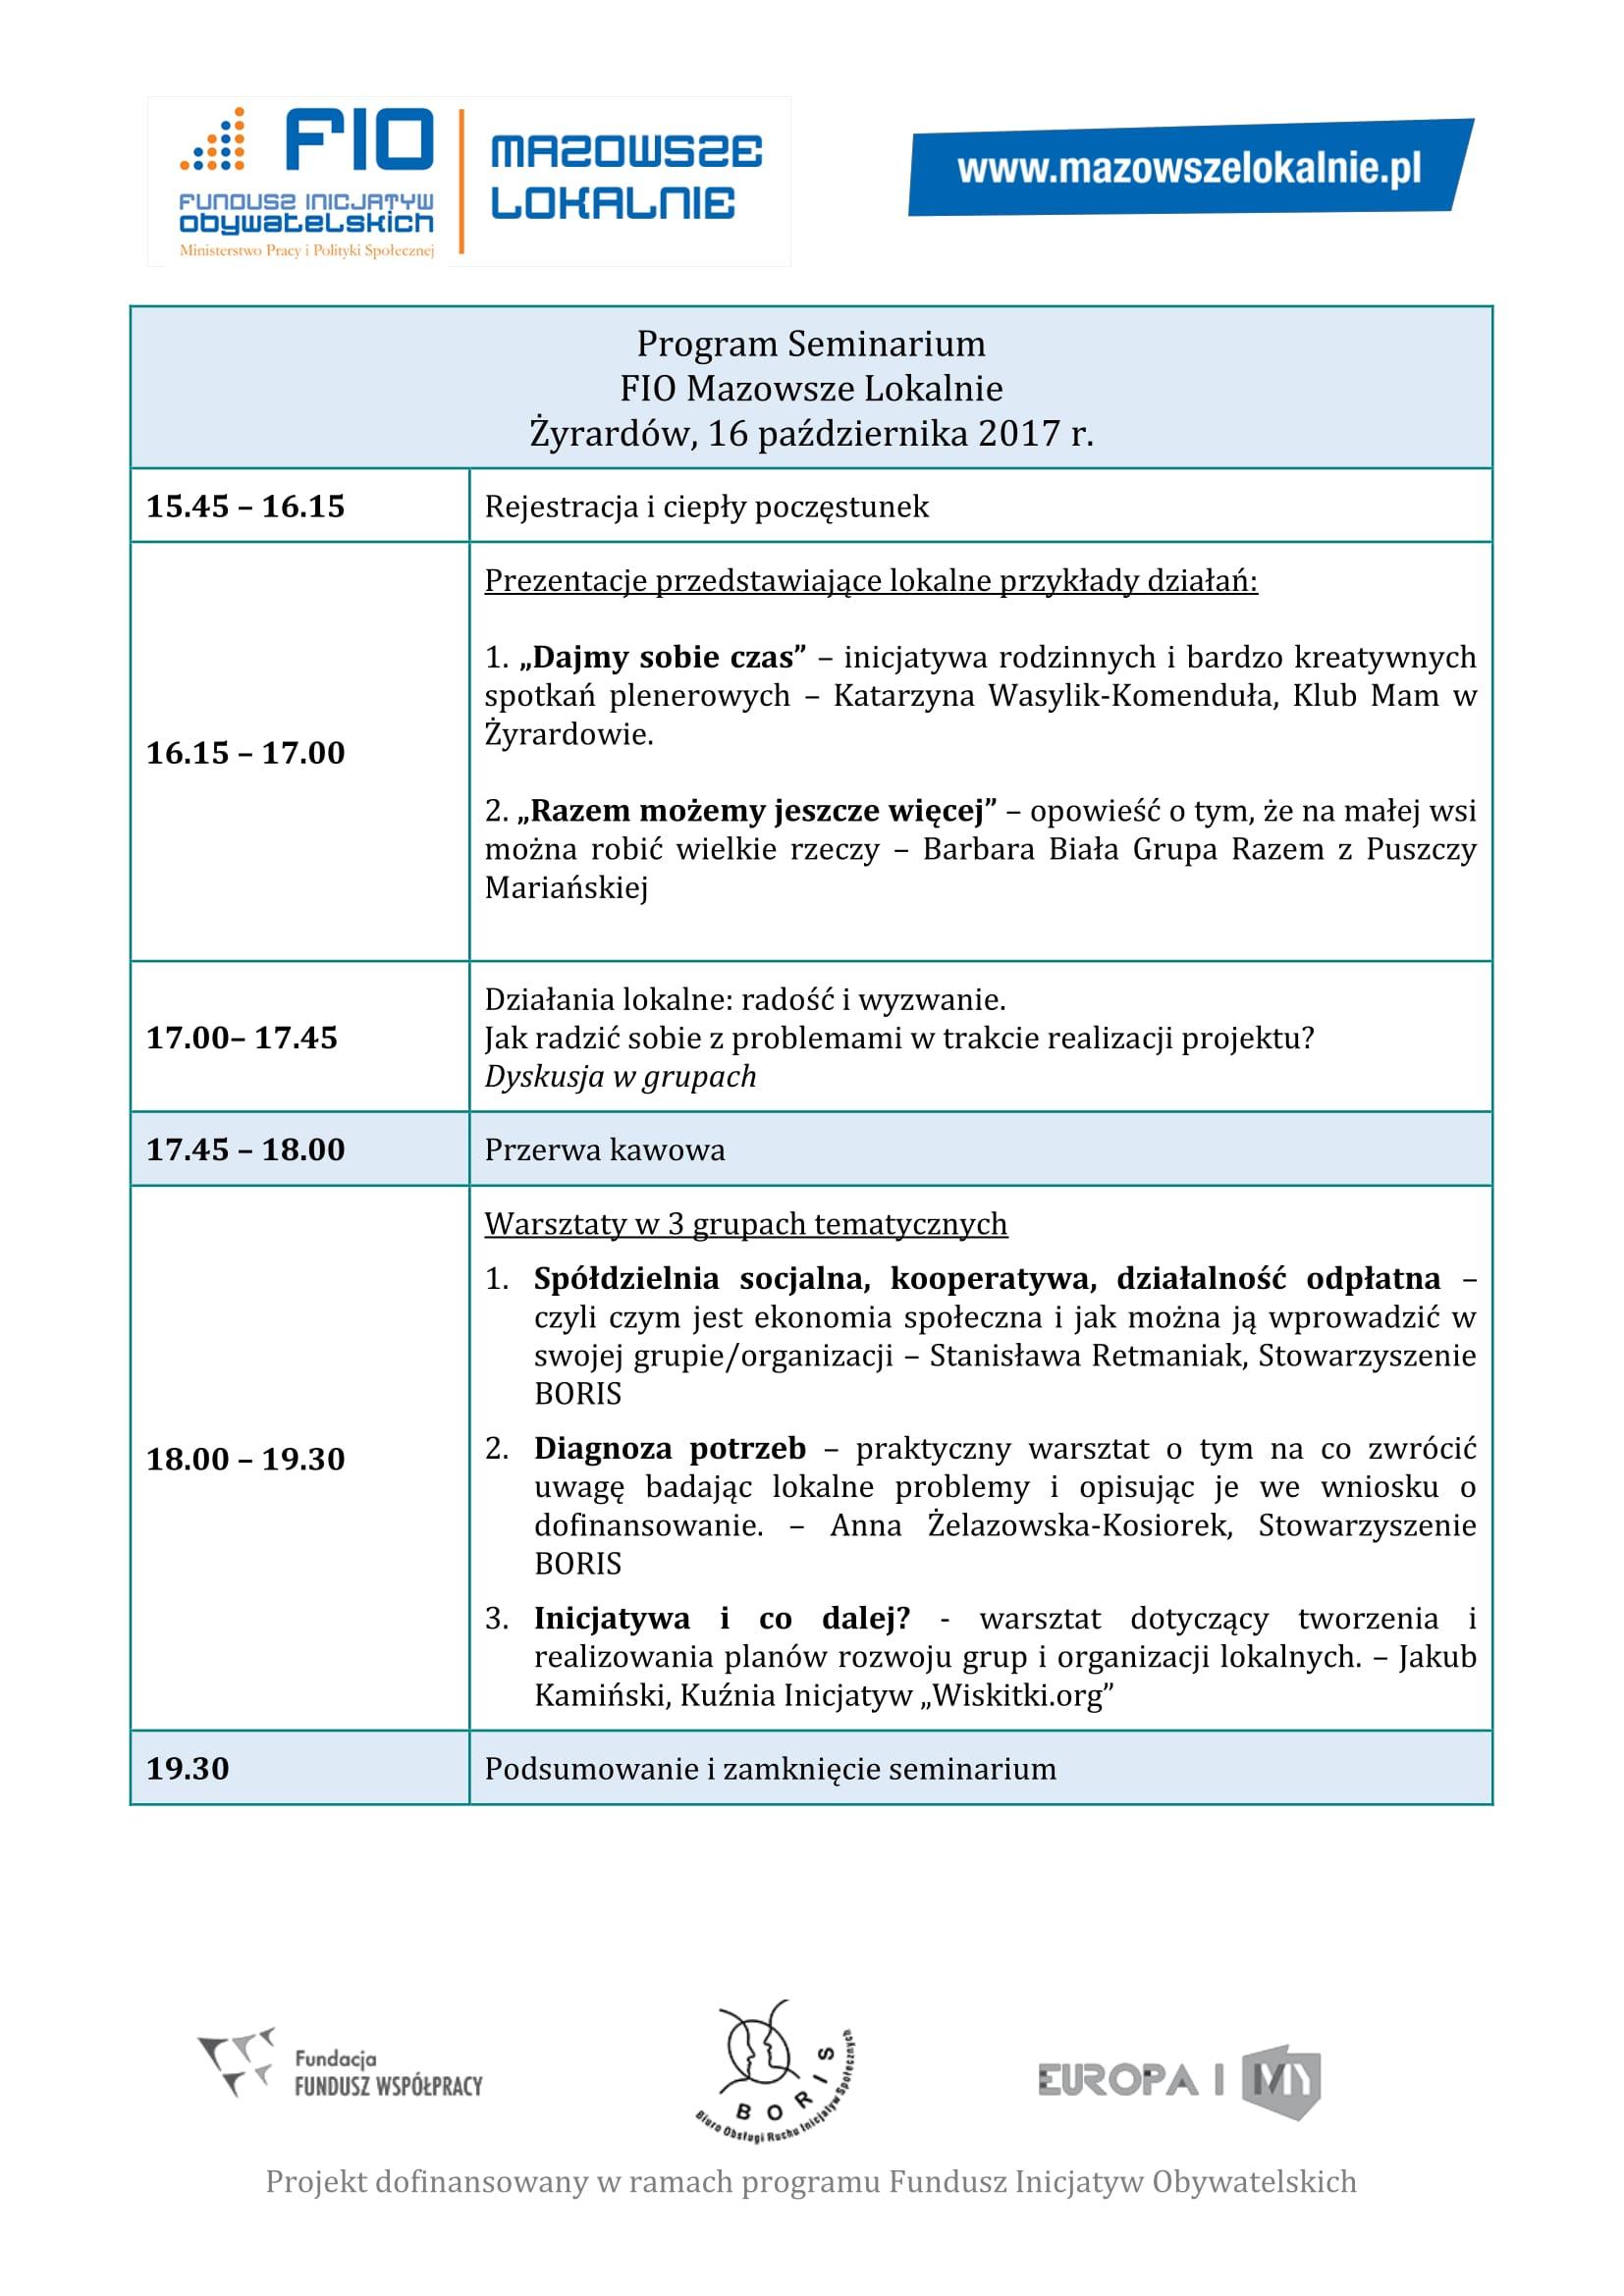 Seminiarium_FIO_Żyrardów_16.10.2017_program-1